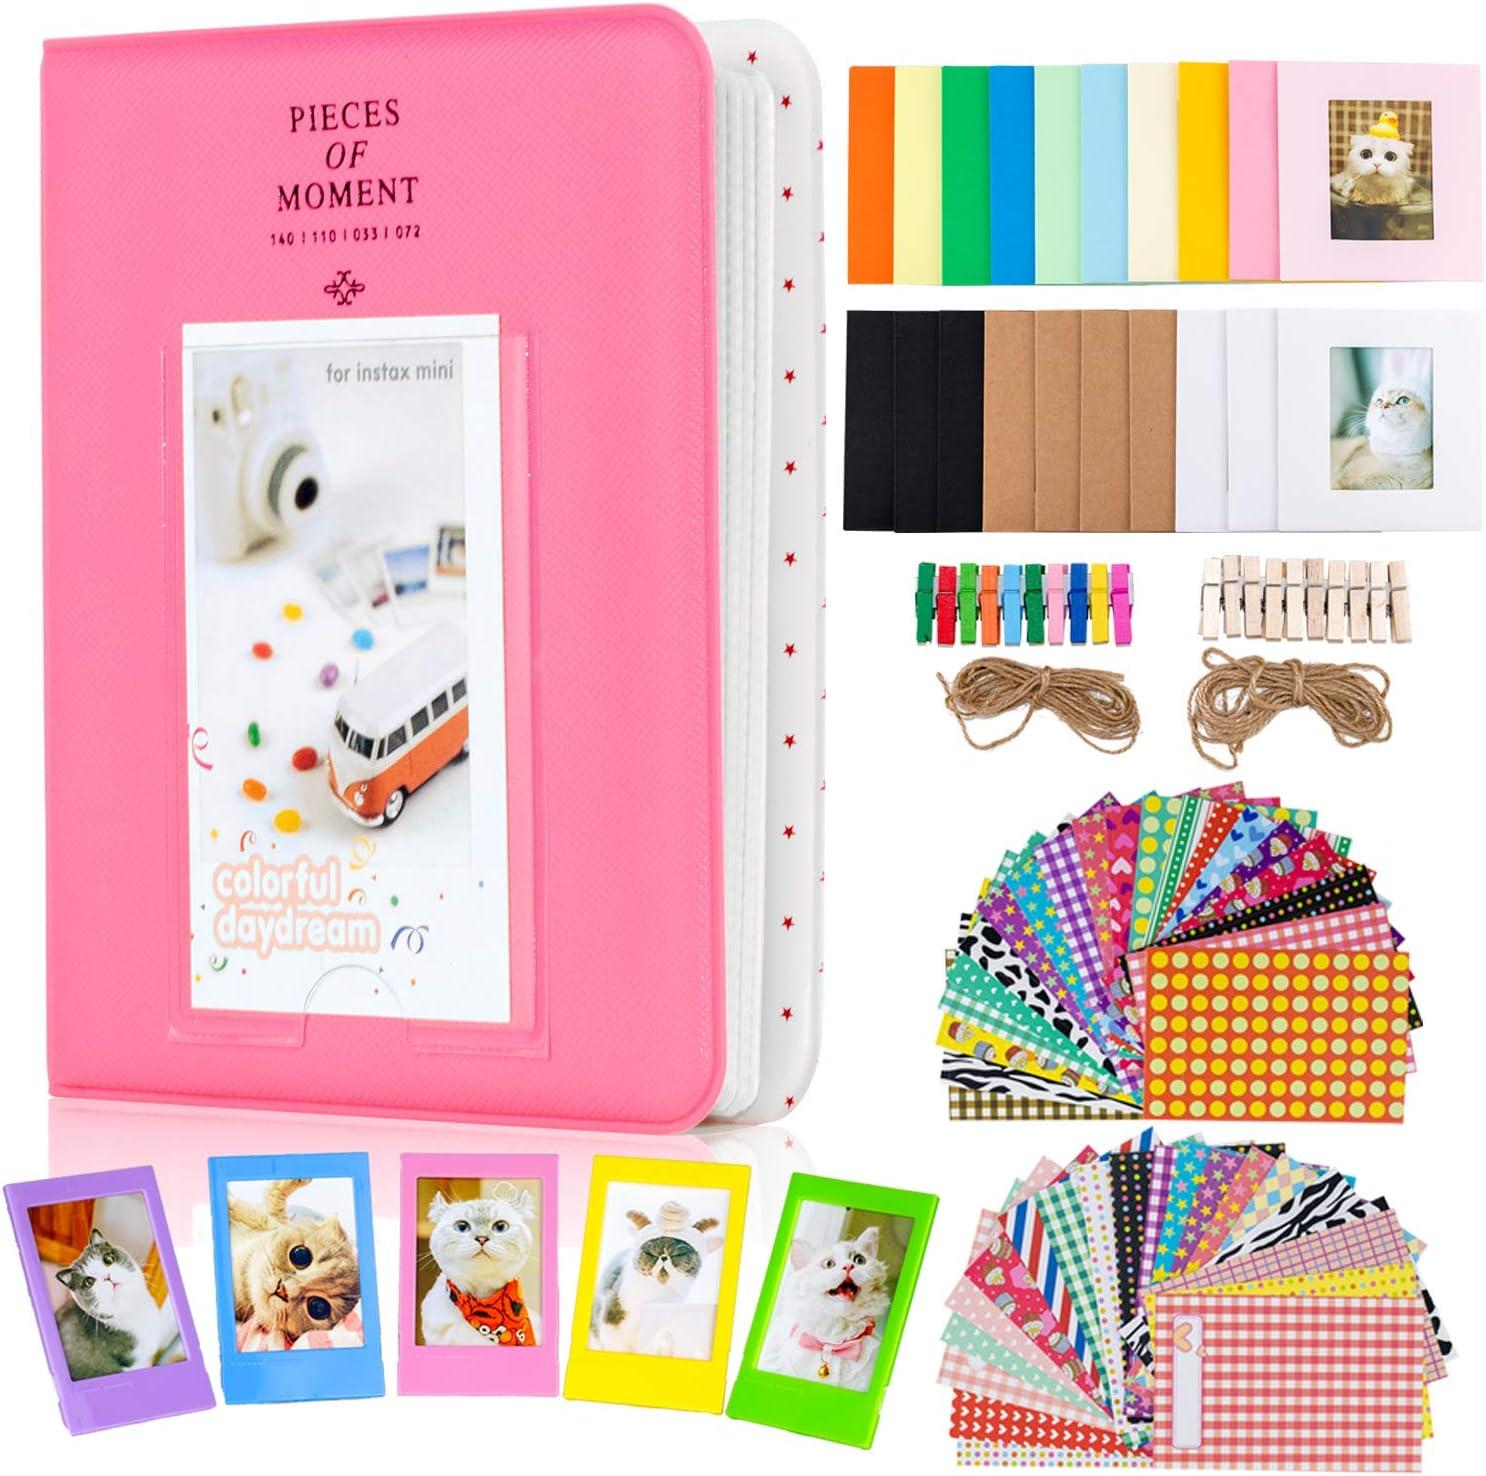 Amimy Fotoalbum Zubehör Bundles Set Für Fujifilm Instax Mini 7s 8 8 9 25 50 S 70 90 Polaroid Snap Pic 300 Hp Ritzel Kodak Mini 3 Zoll Film 64 Taschen Flamingo Pink Küche Haushalt